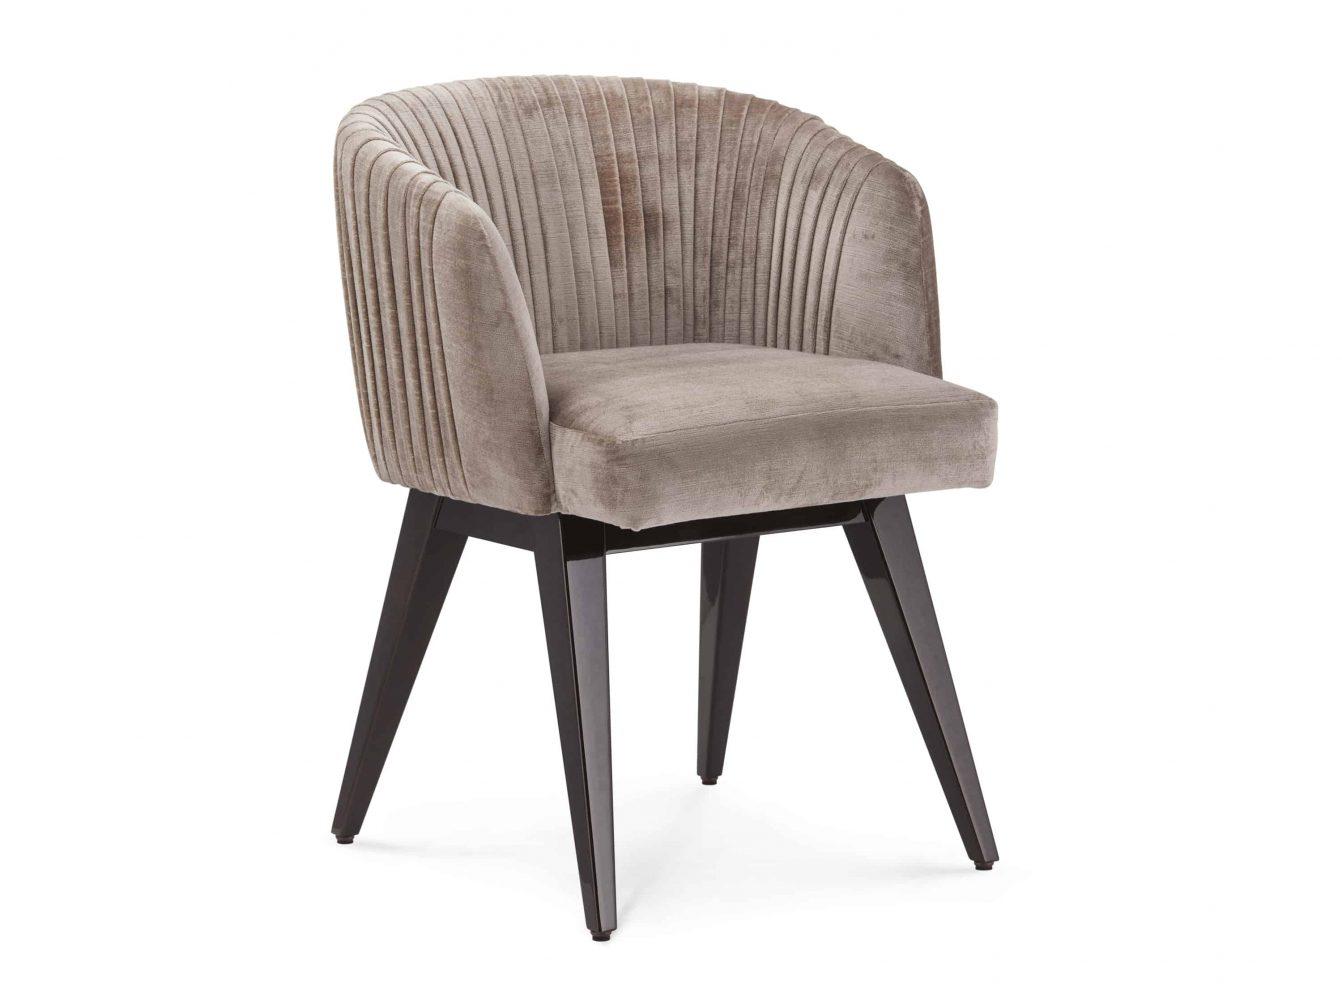 Eleanor-G701918-Chair-S-02